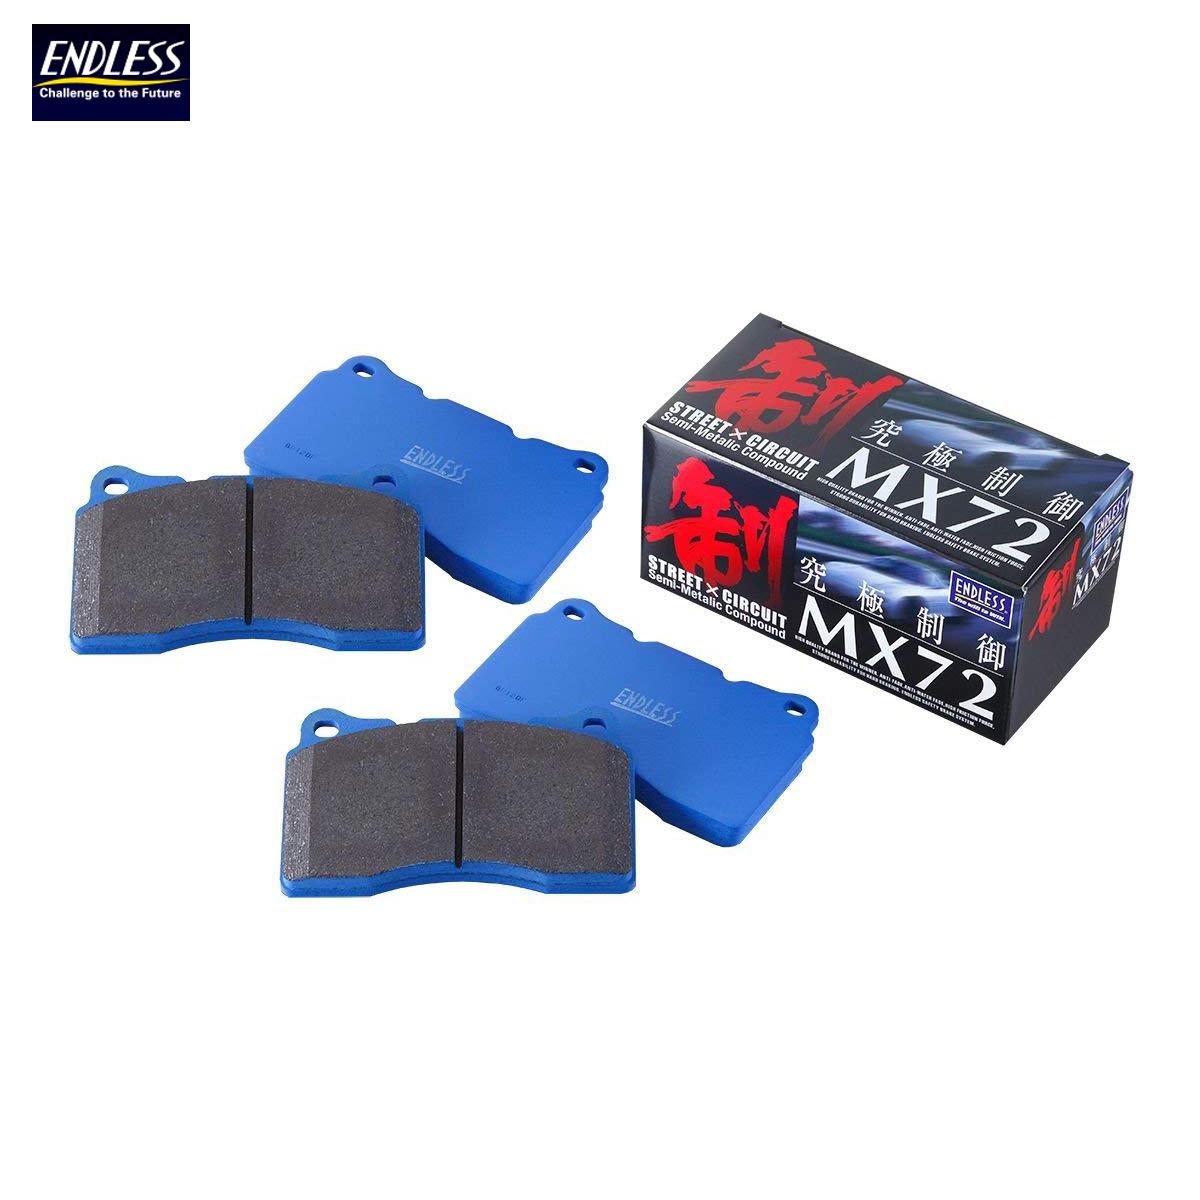 ENDLESS エンドレス ブレーキパッド MX72セット フロント EP449 リア EP385 ヴォクシー VOXY ZRR70G 75G 4輪ディスク